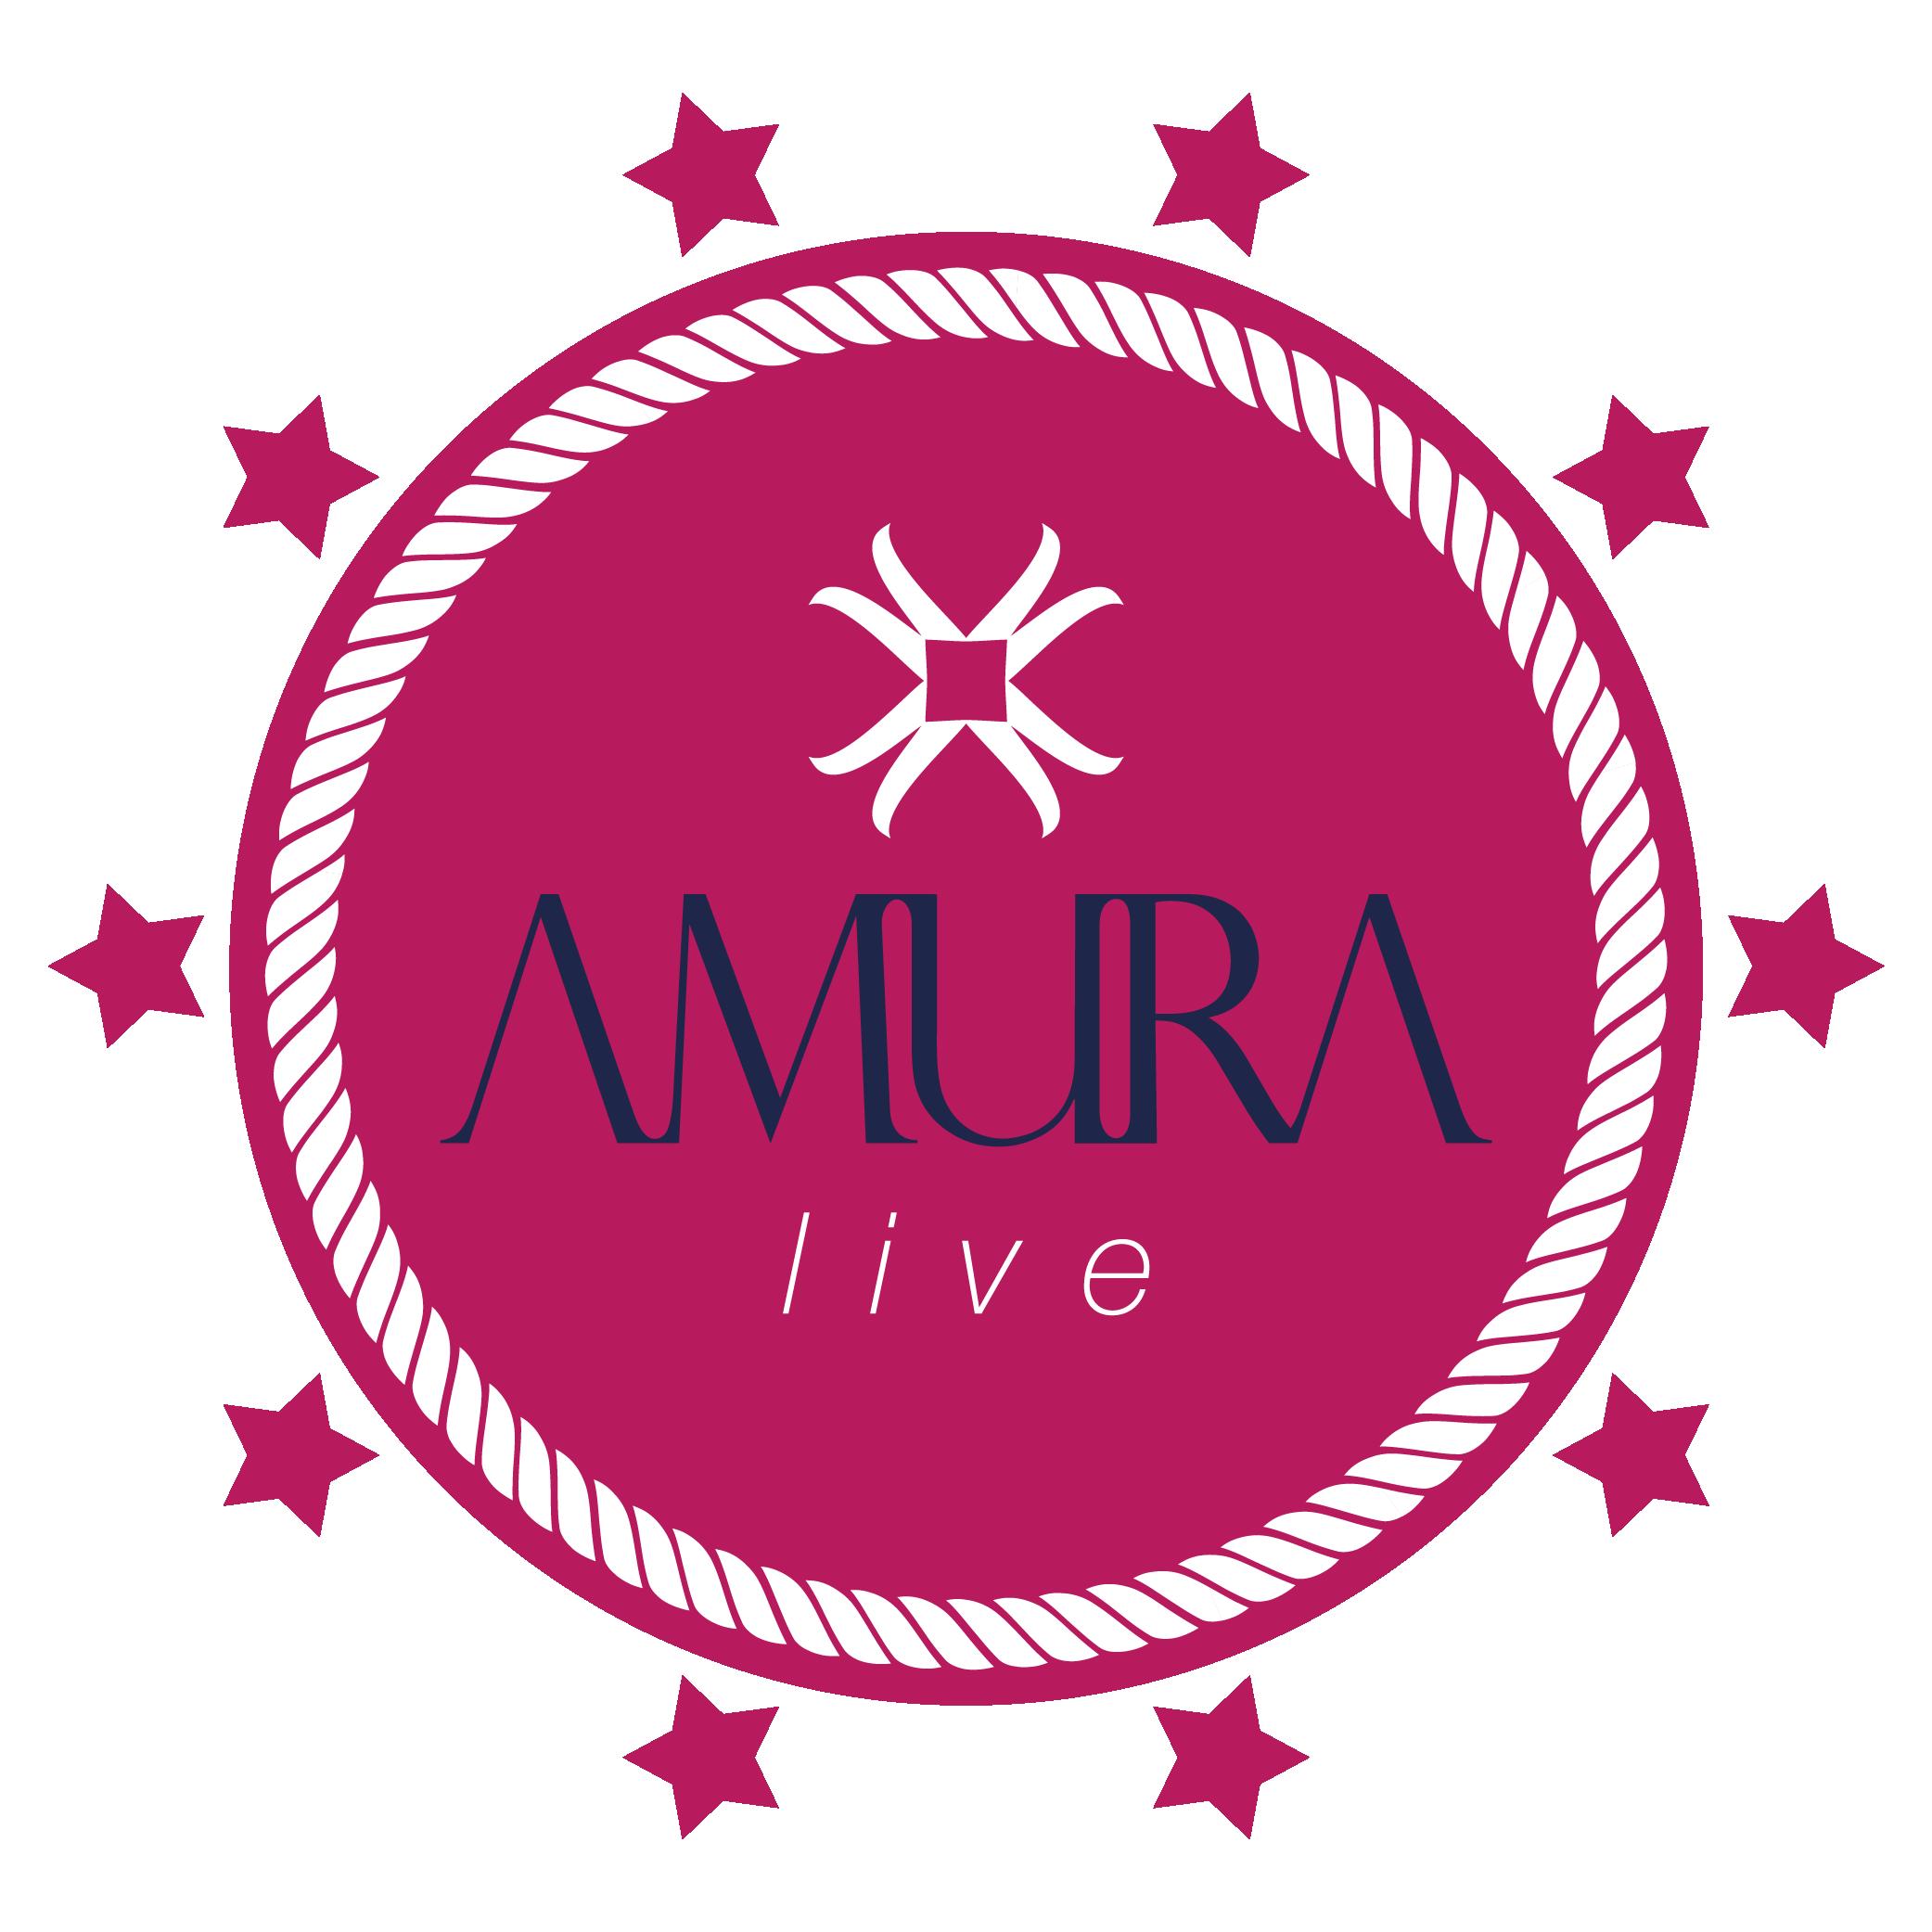 Amura Live